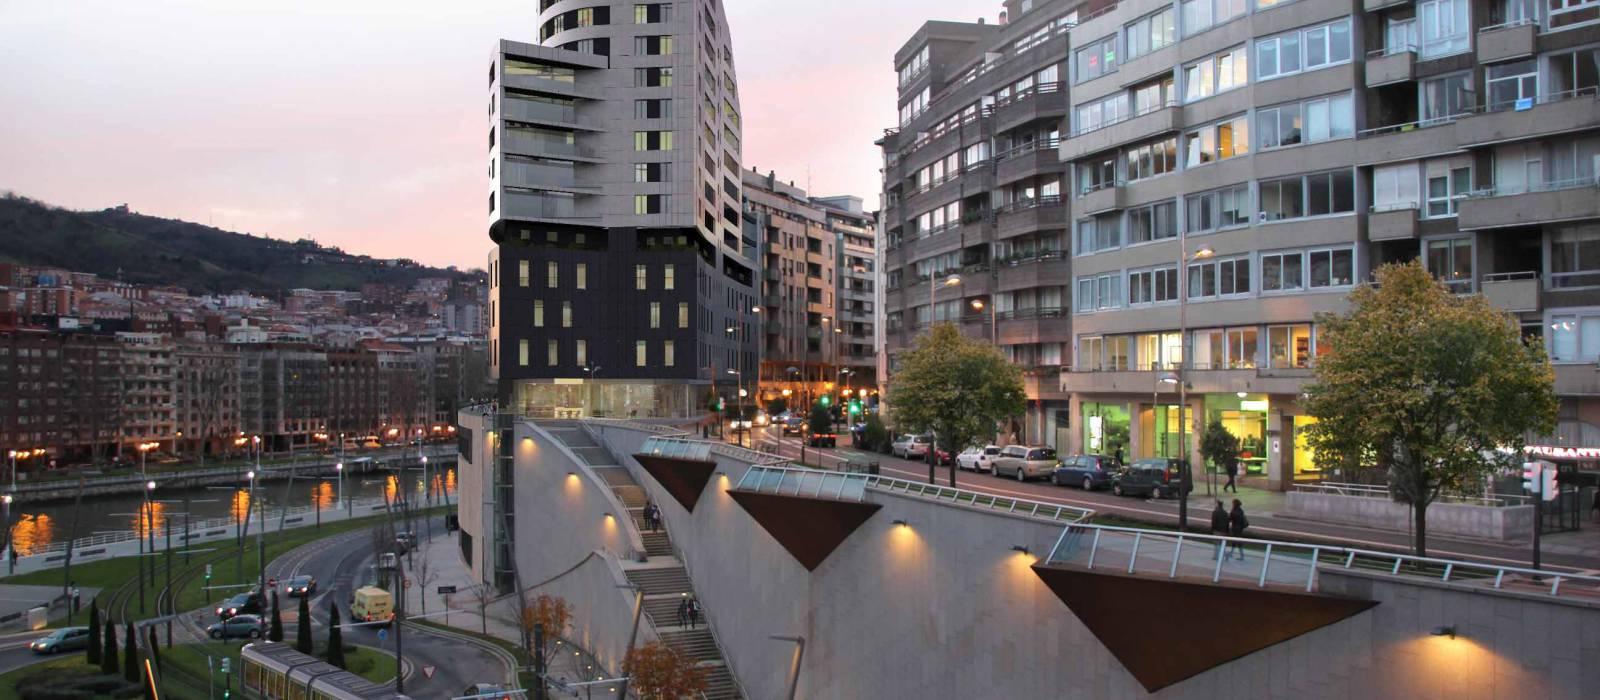 Hotel Bilbao - Fachada 2